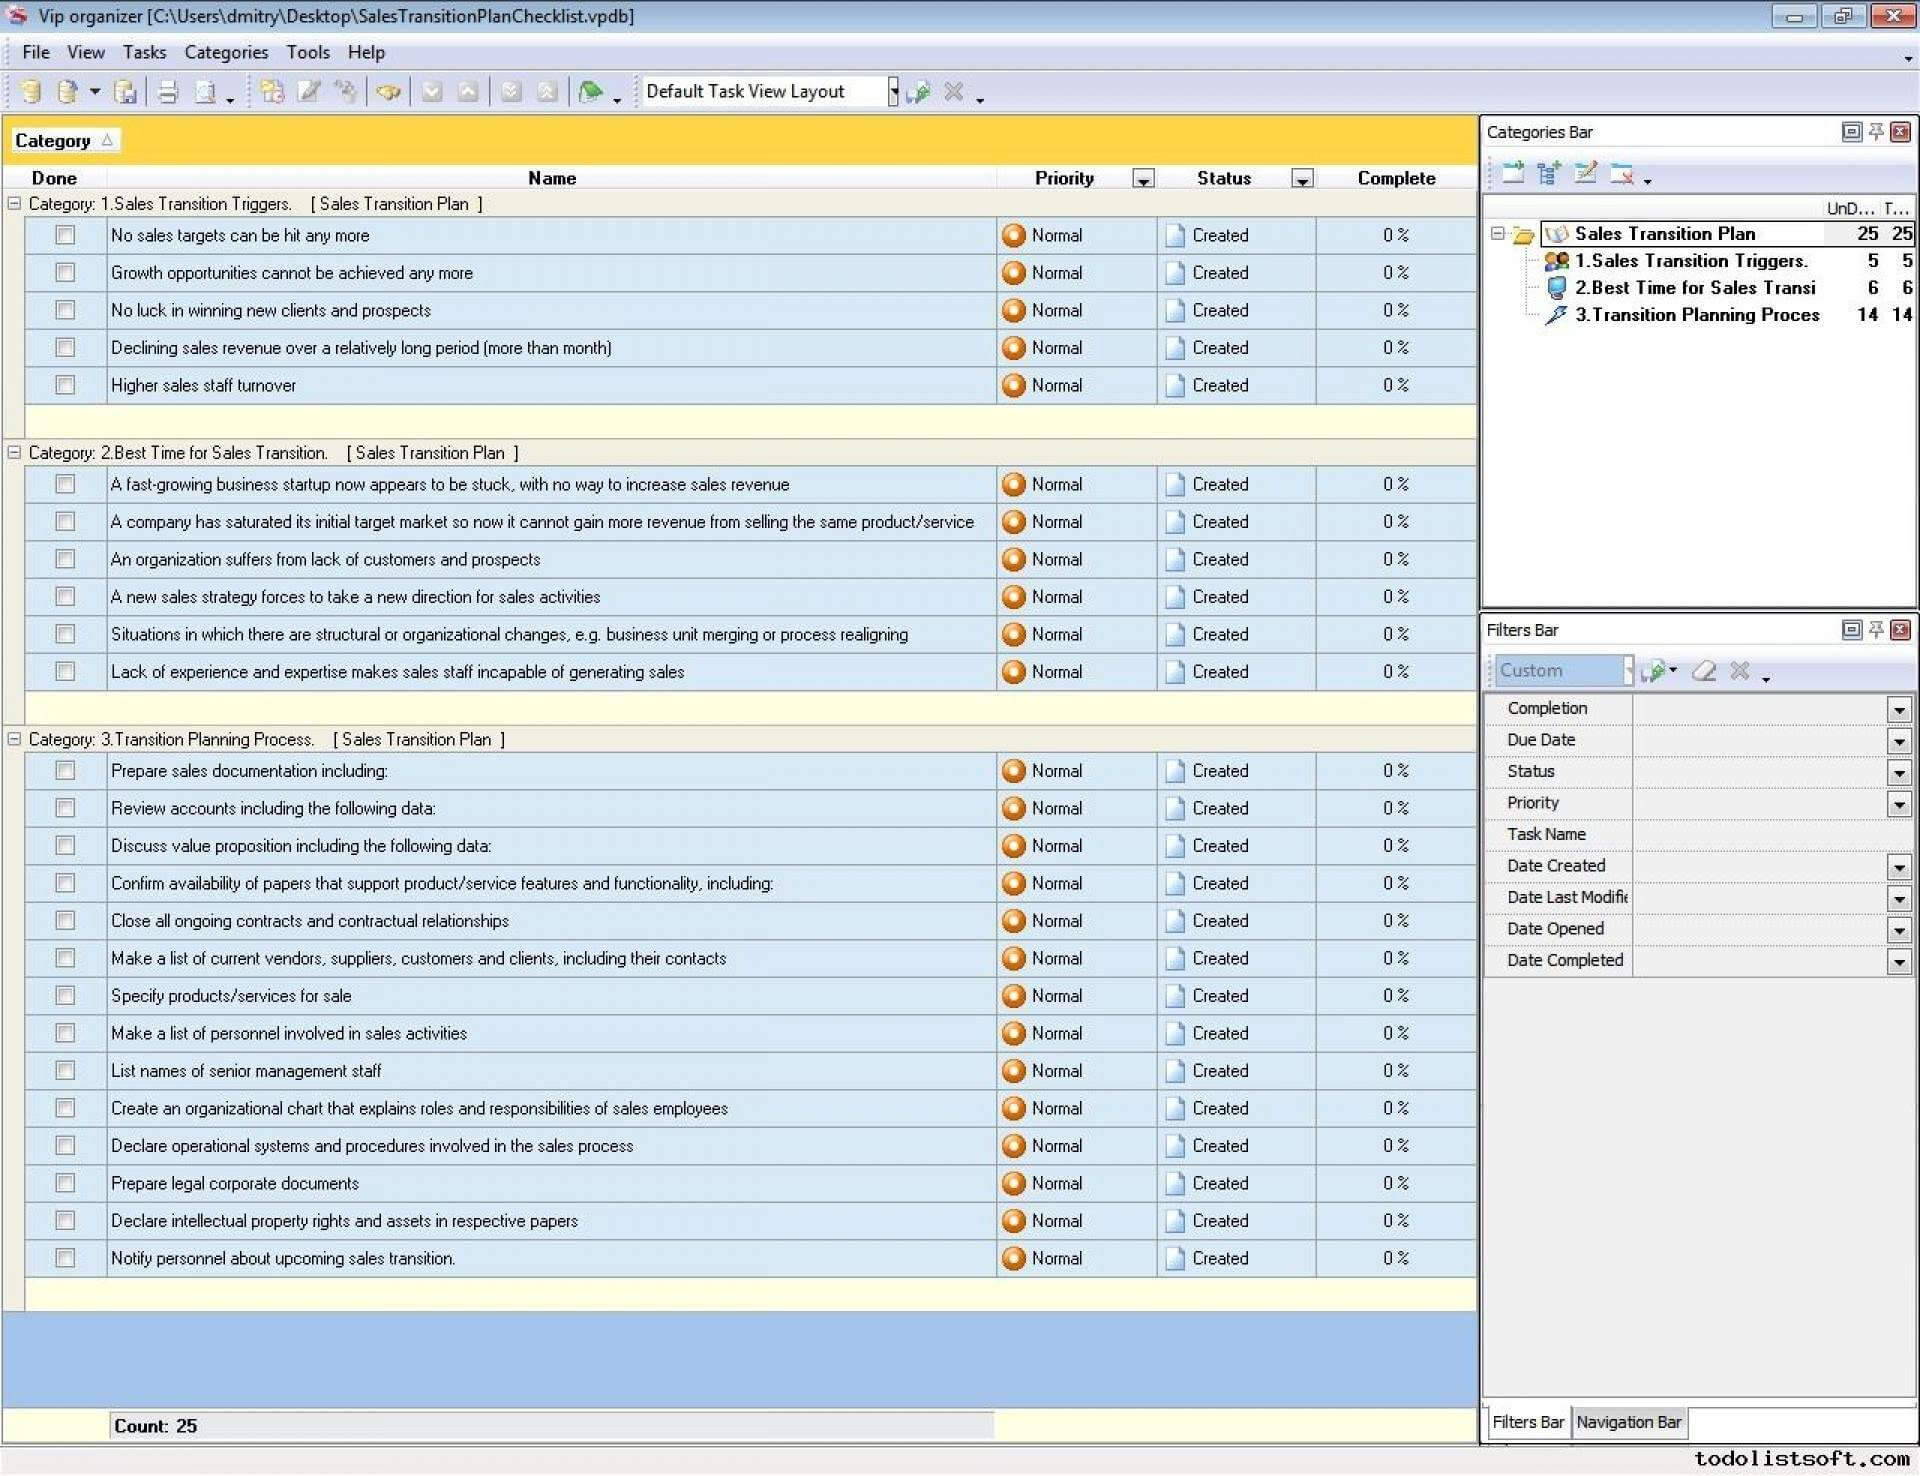 020 Business Process Transition Plan Template Beautiful Within Business Process Transition Plan Template